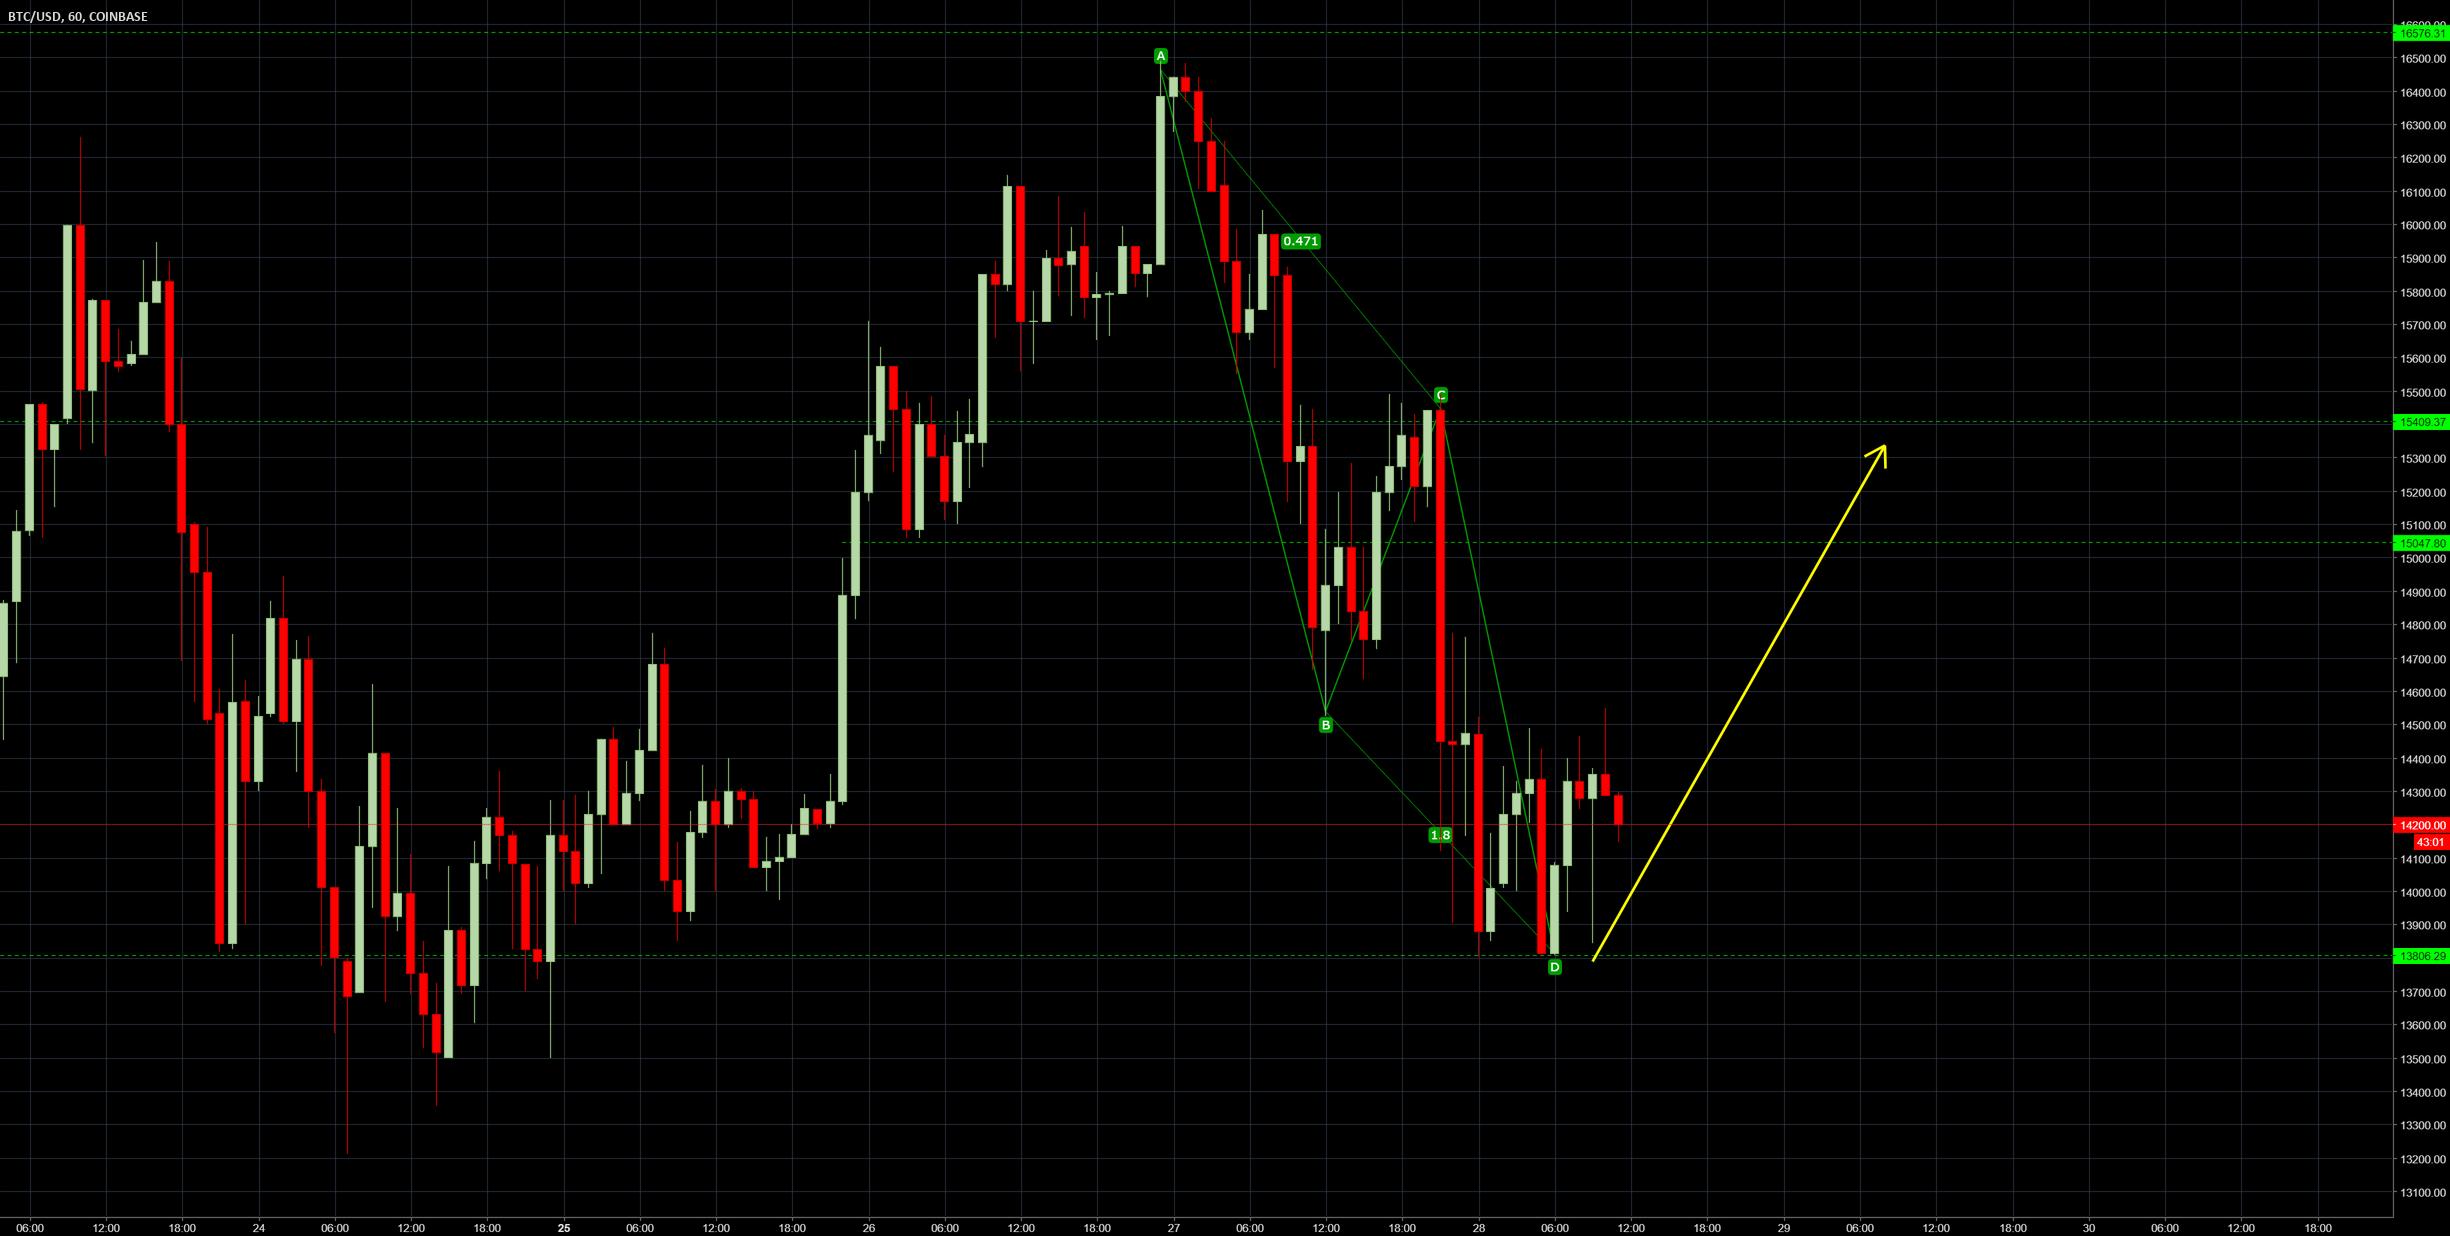 Bullish AB=CD pattern in 1HR chart.